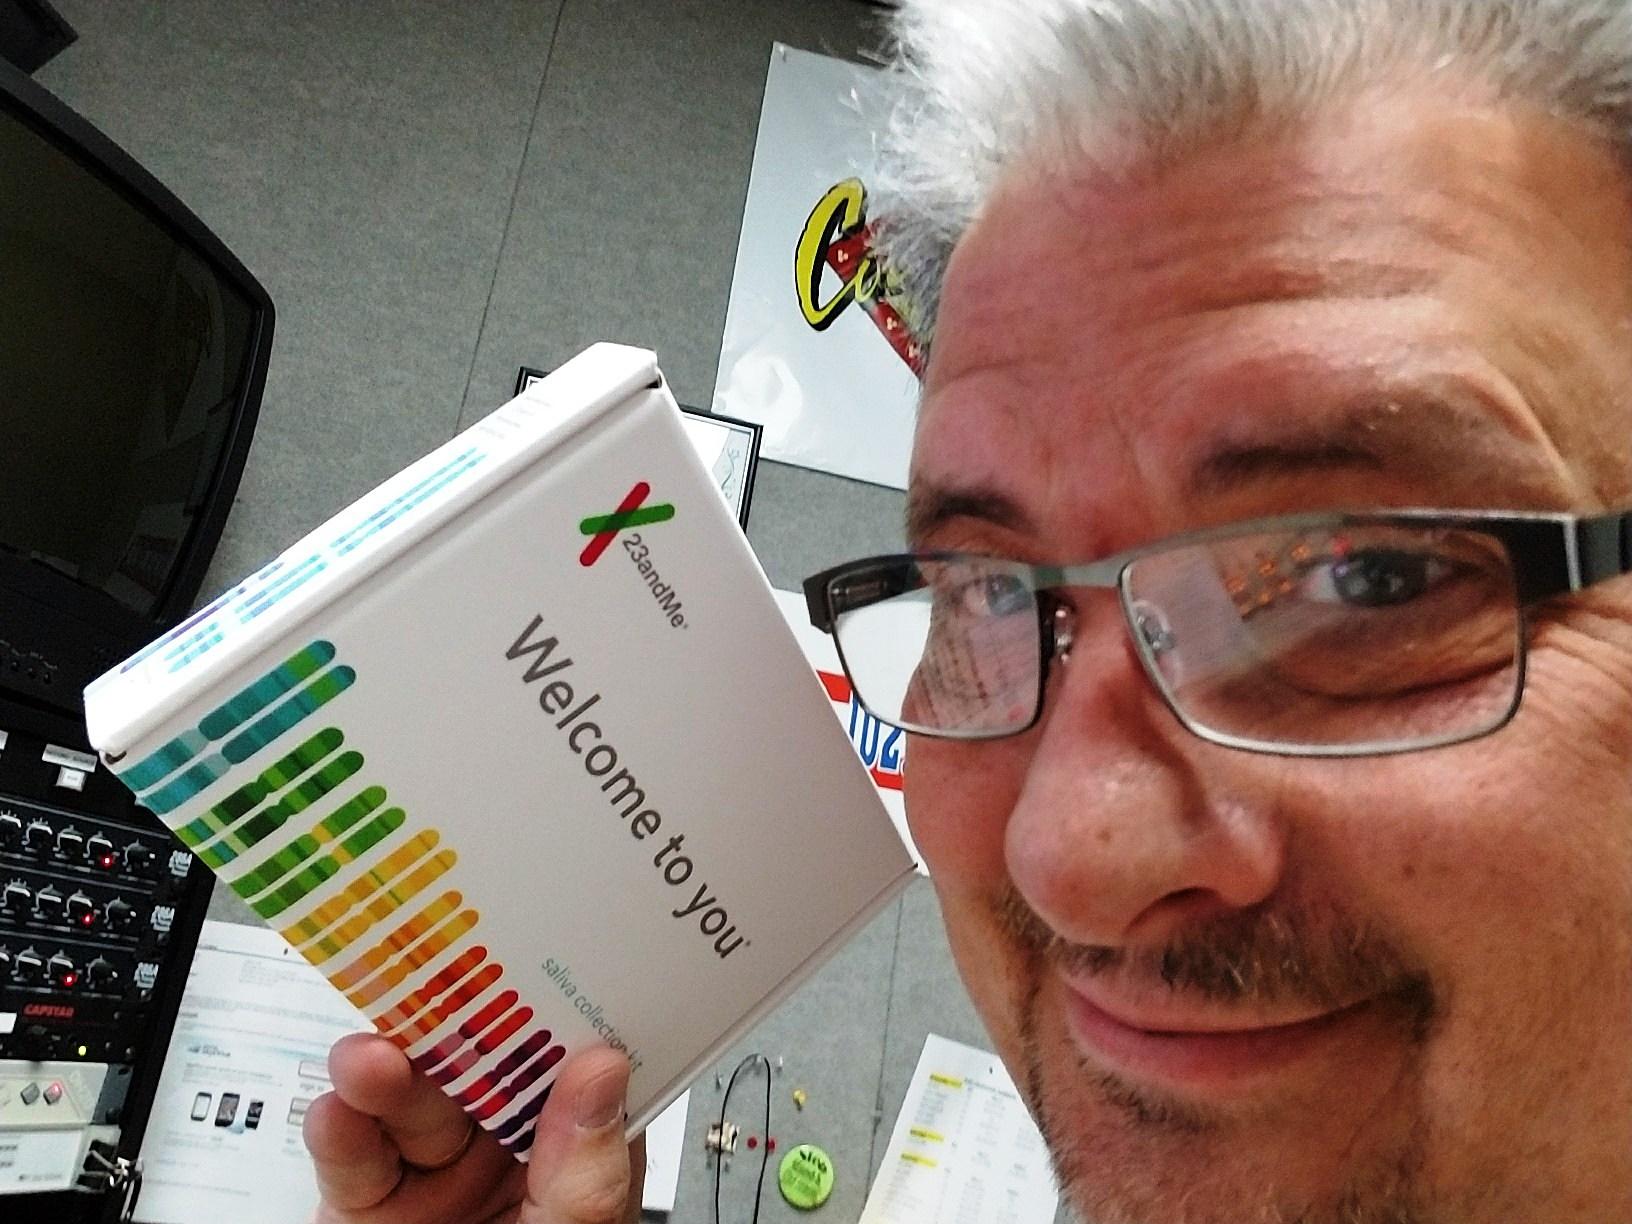 23andMe - me and box